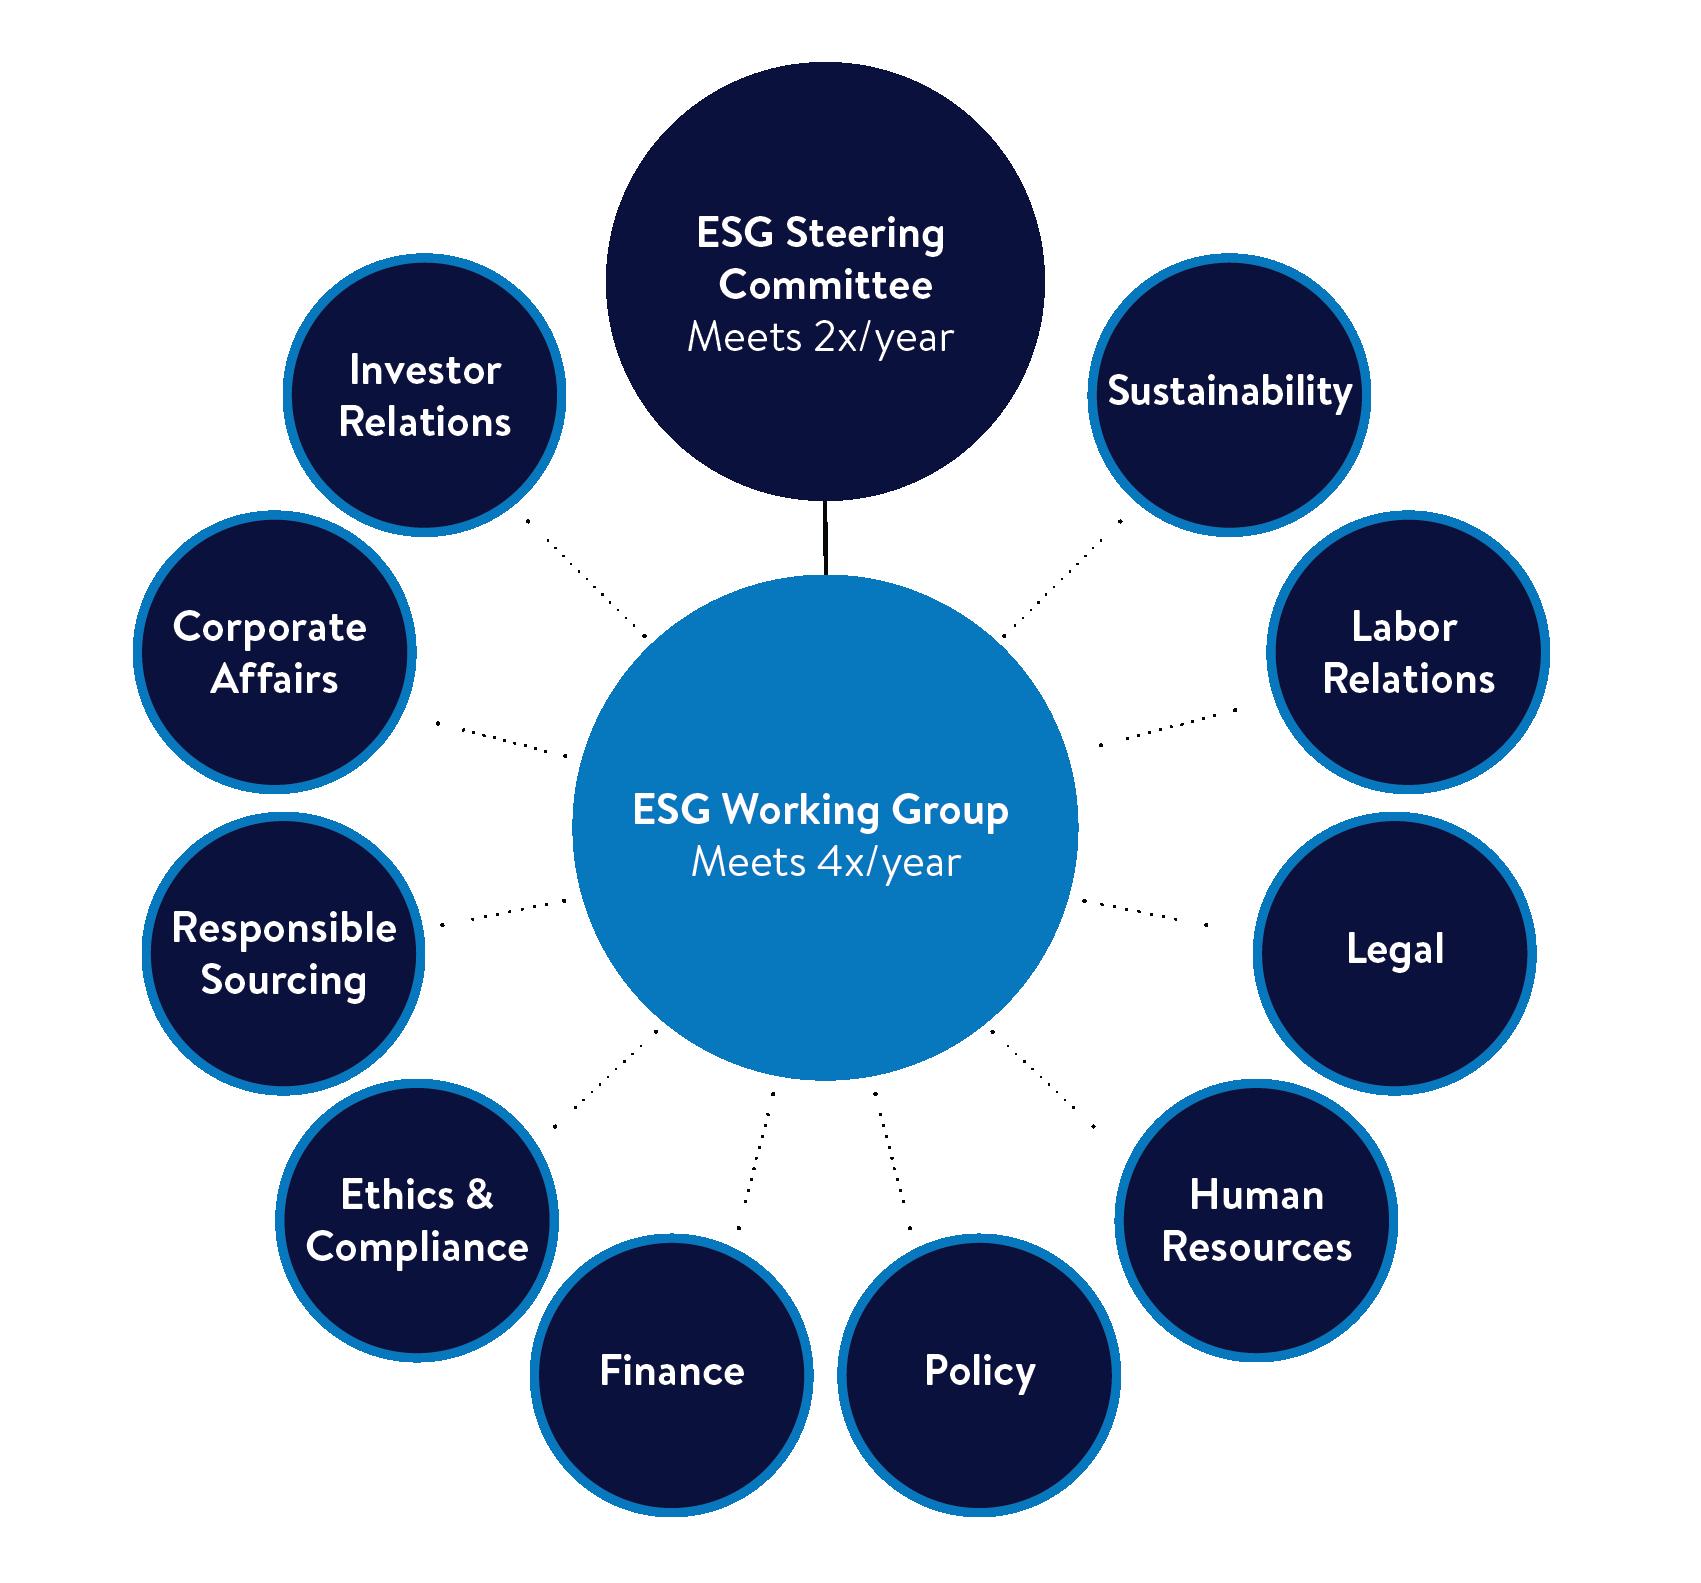 ESG-Governance-1@2x.png